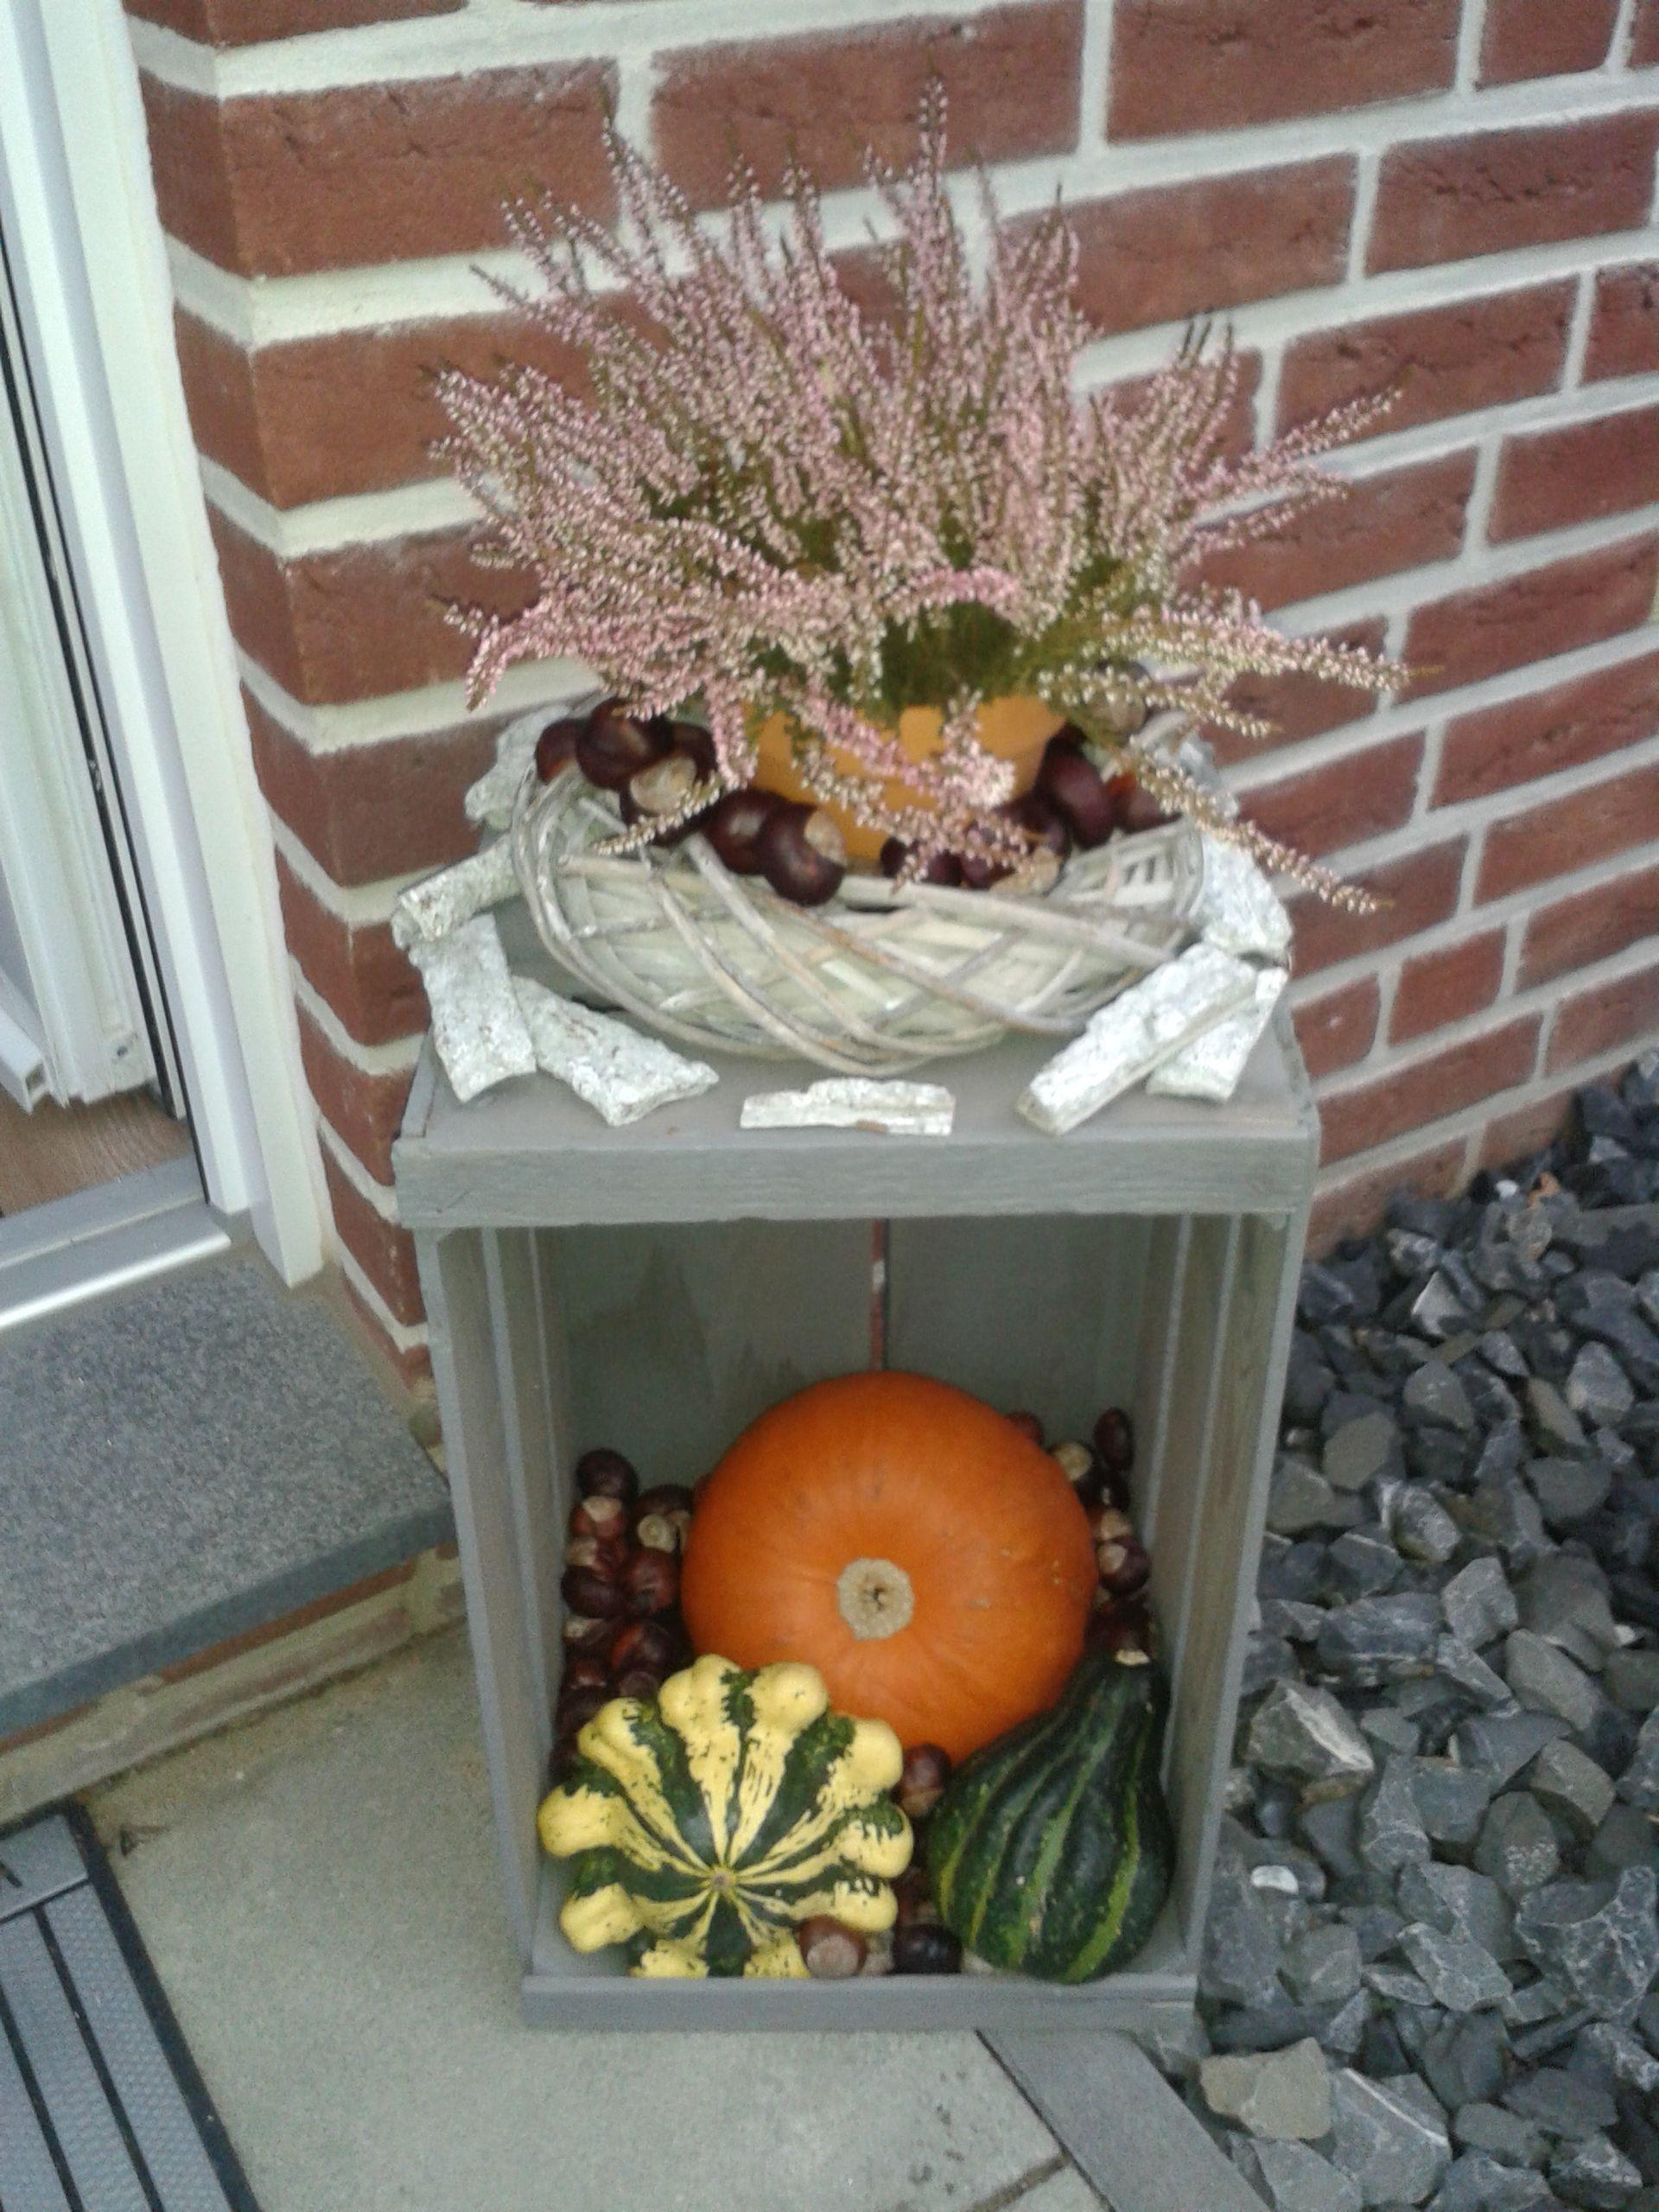 Herbstdeko Haustur 2 Herbstdeko Haustur 2 Fantastische Hinter Und Vorgarten Landschaftsentwurfe Die Mei Herbst Dekoration Vorgarten Dekorieren Herbst Dekor